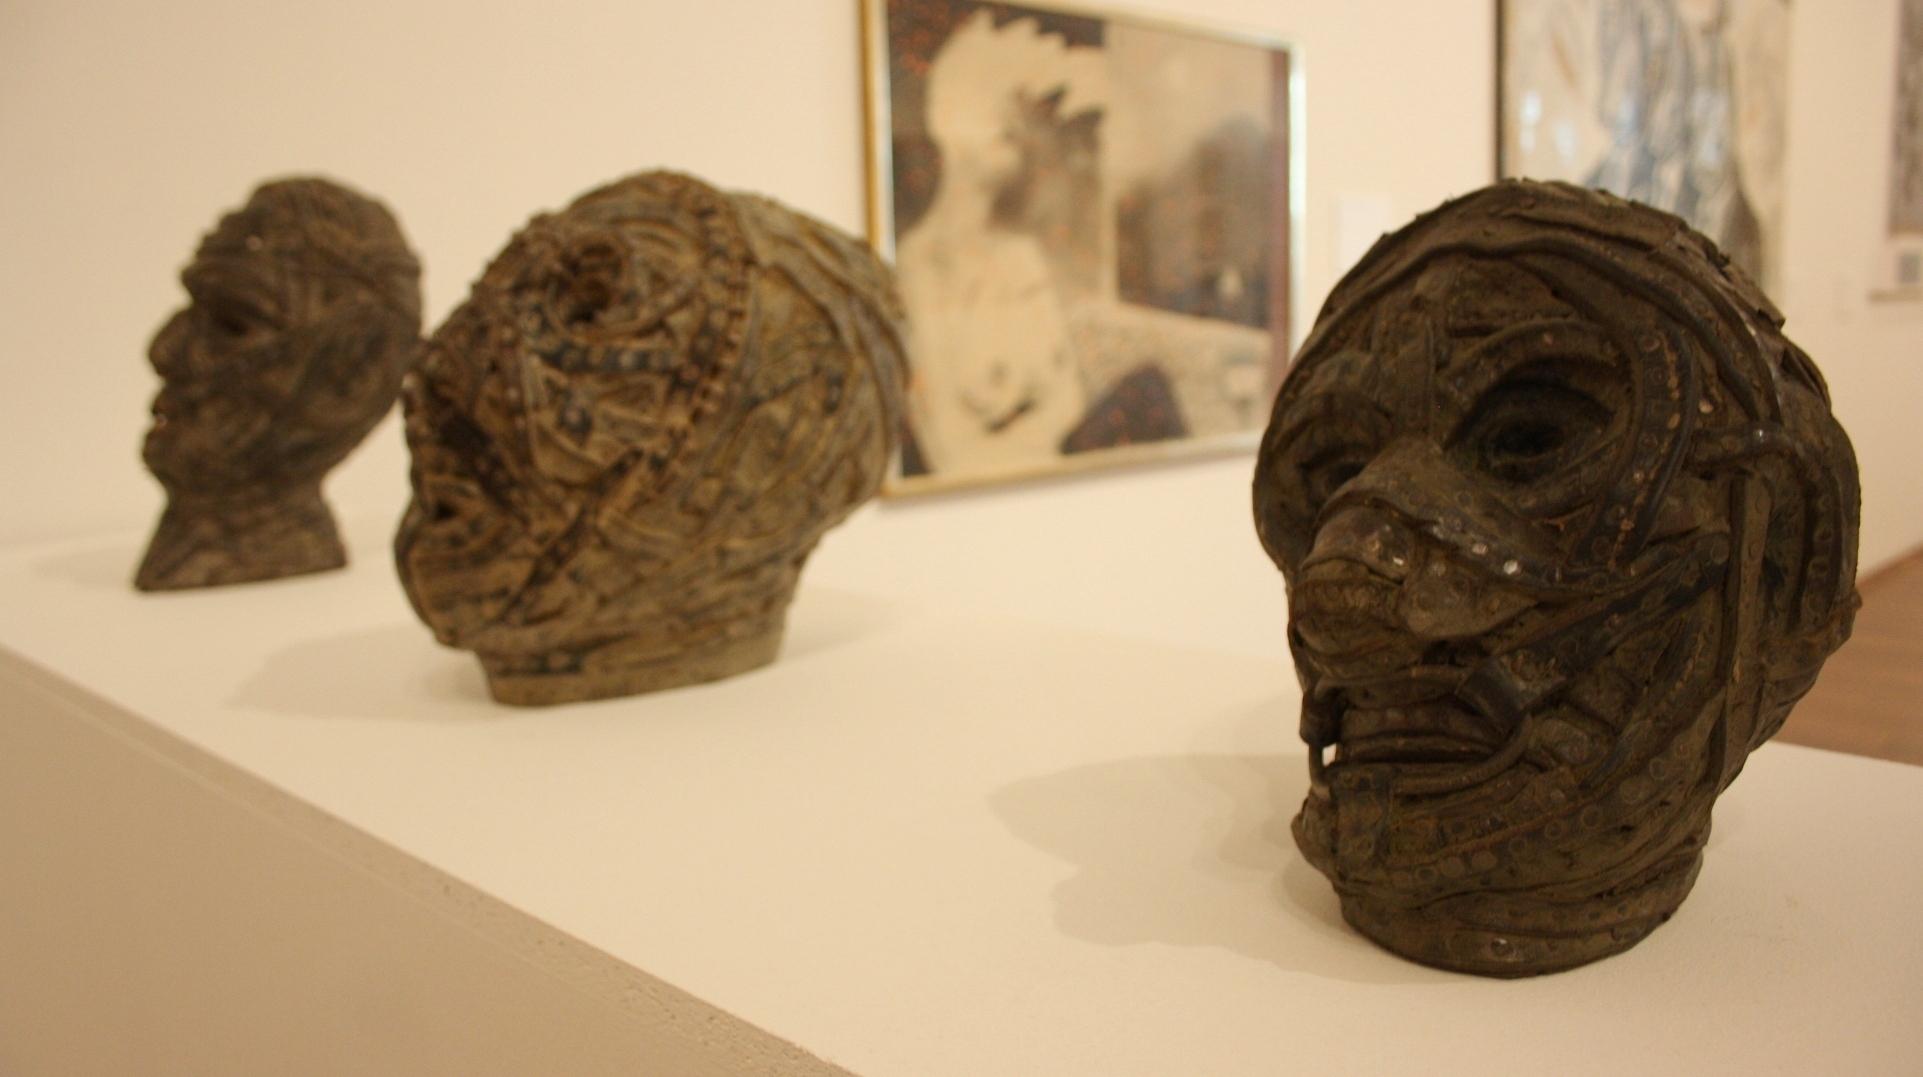 Gaál József, Bello Brutto IV., VI., VII., 2007, fa, bőr, vas